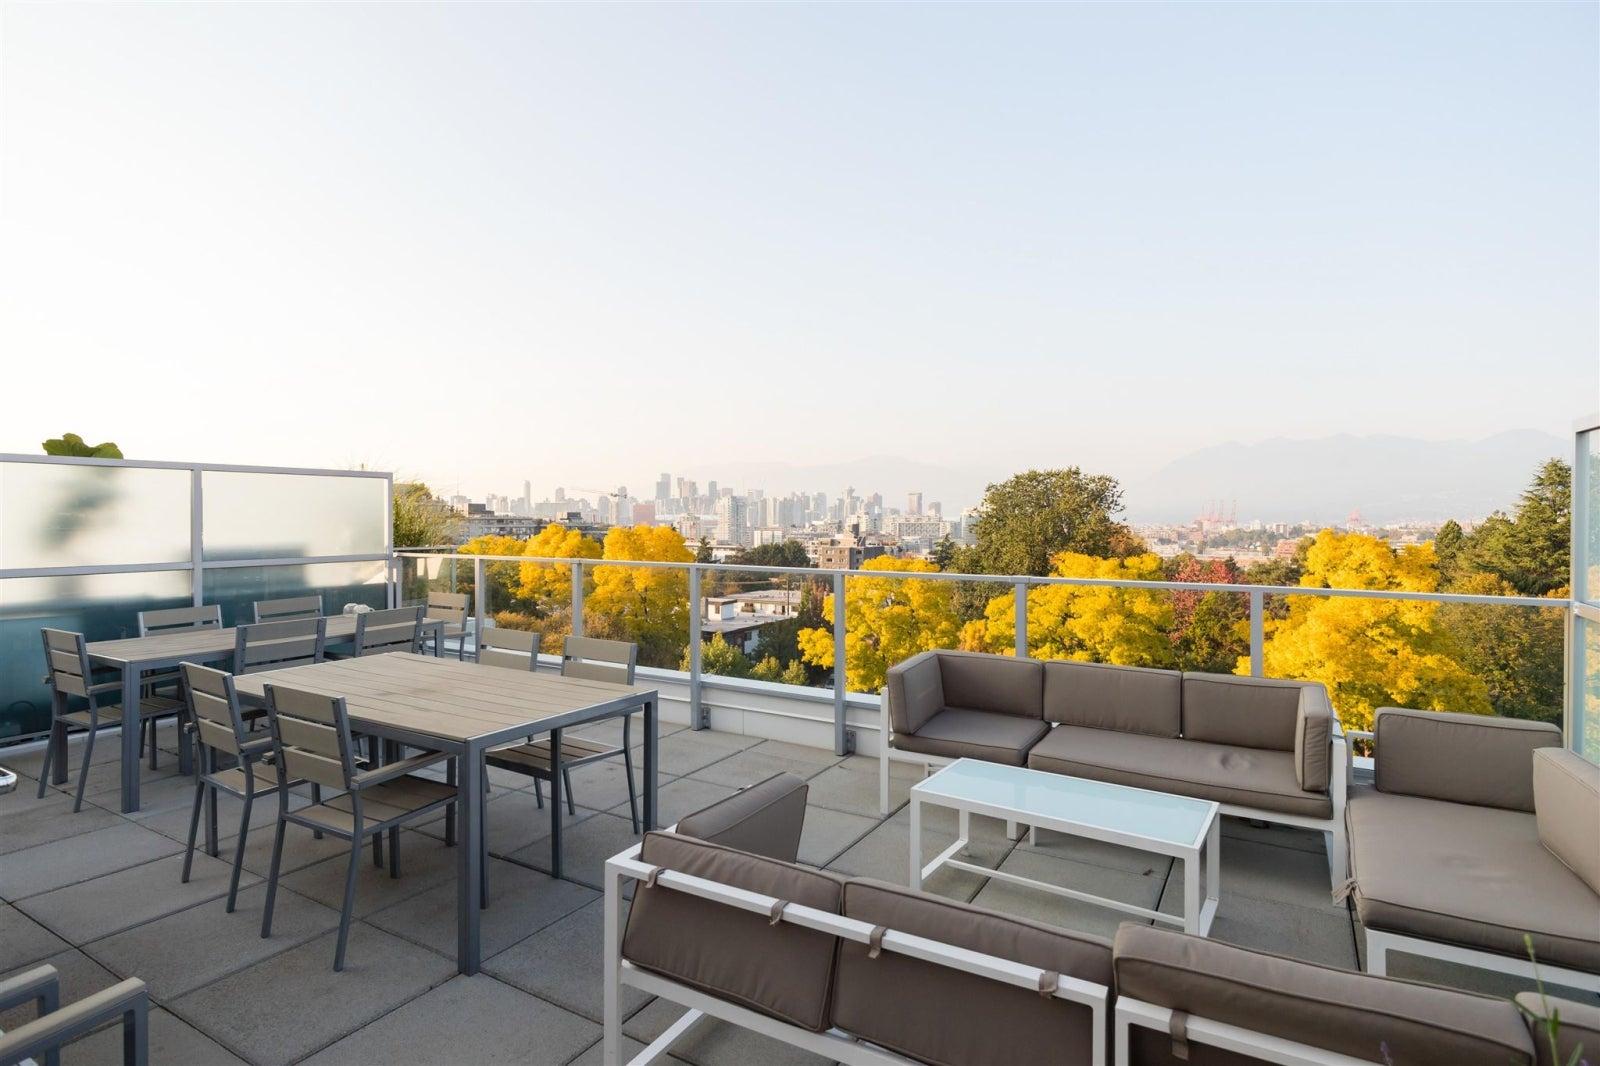 408 379 E BROADWAY AVENUE - Mount Pleasant VE Apartment/Condo for sale, 2 Bedrooms (R2599900) #28